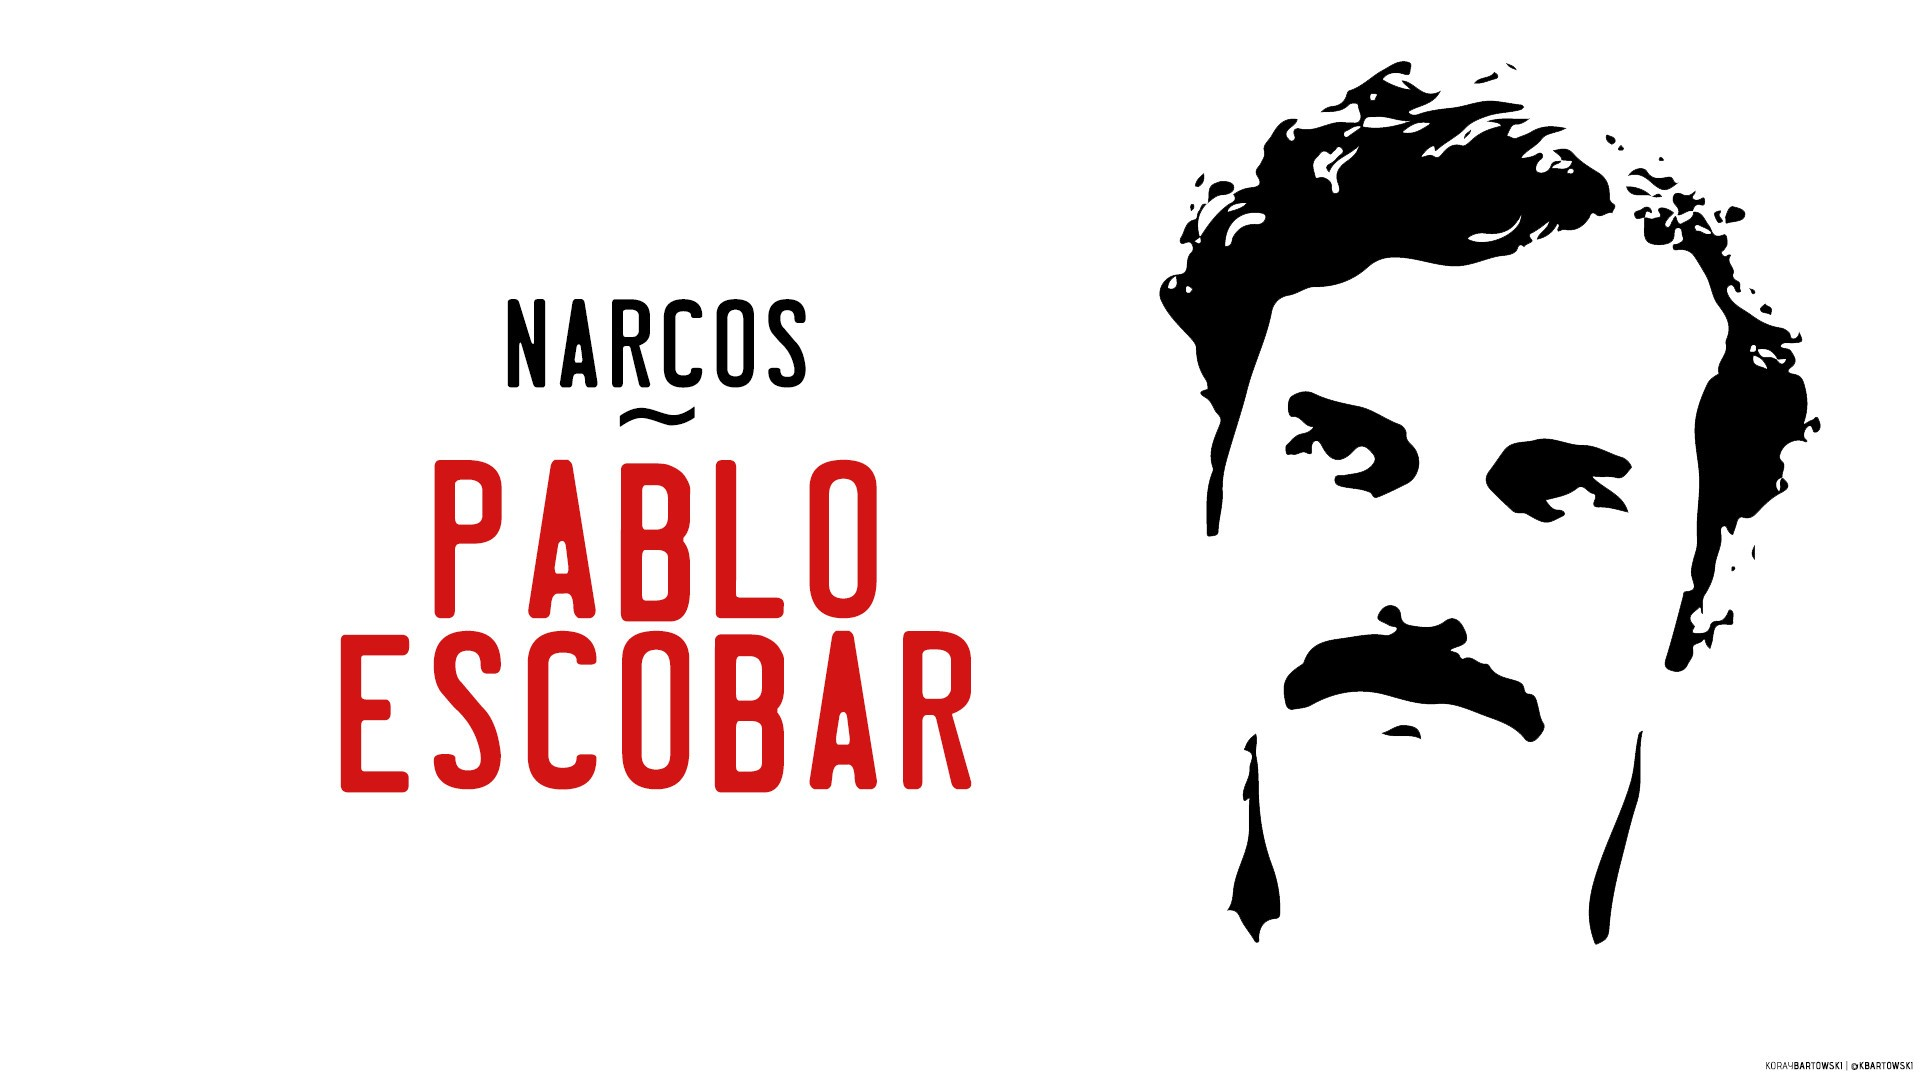 Narcos android wallpaper